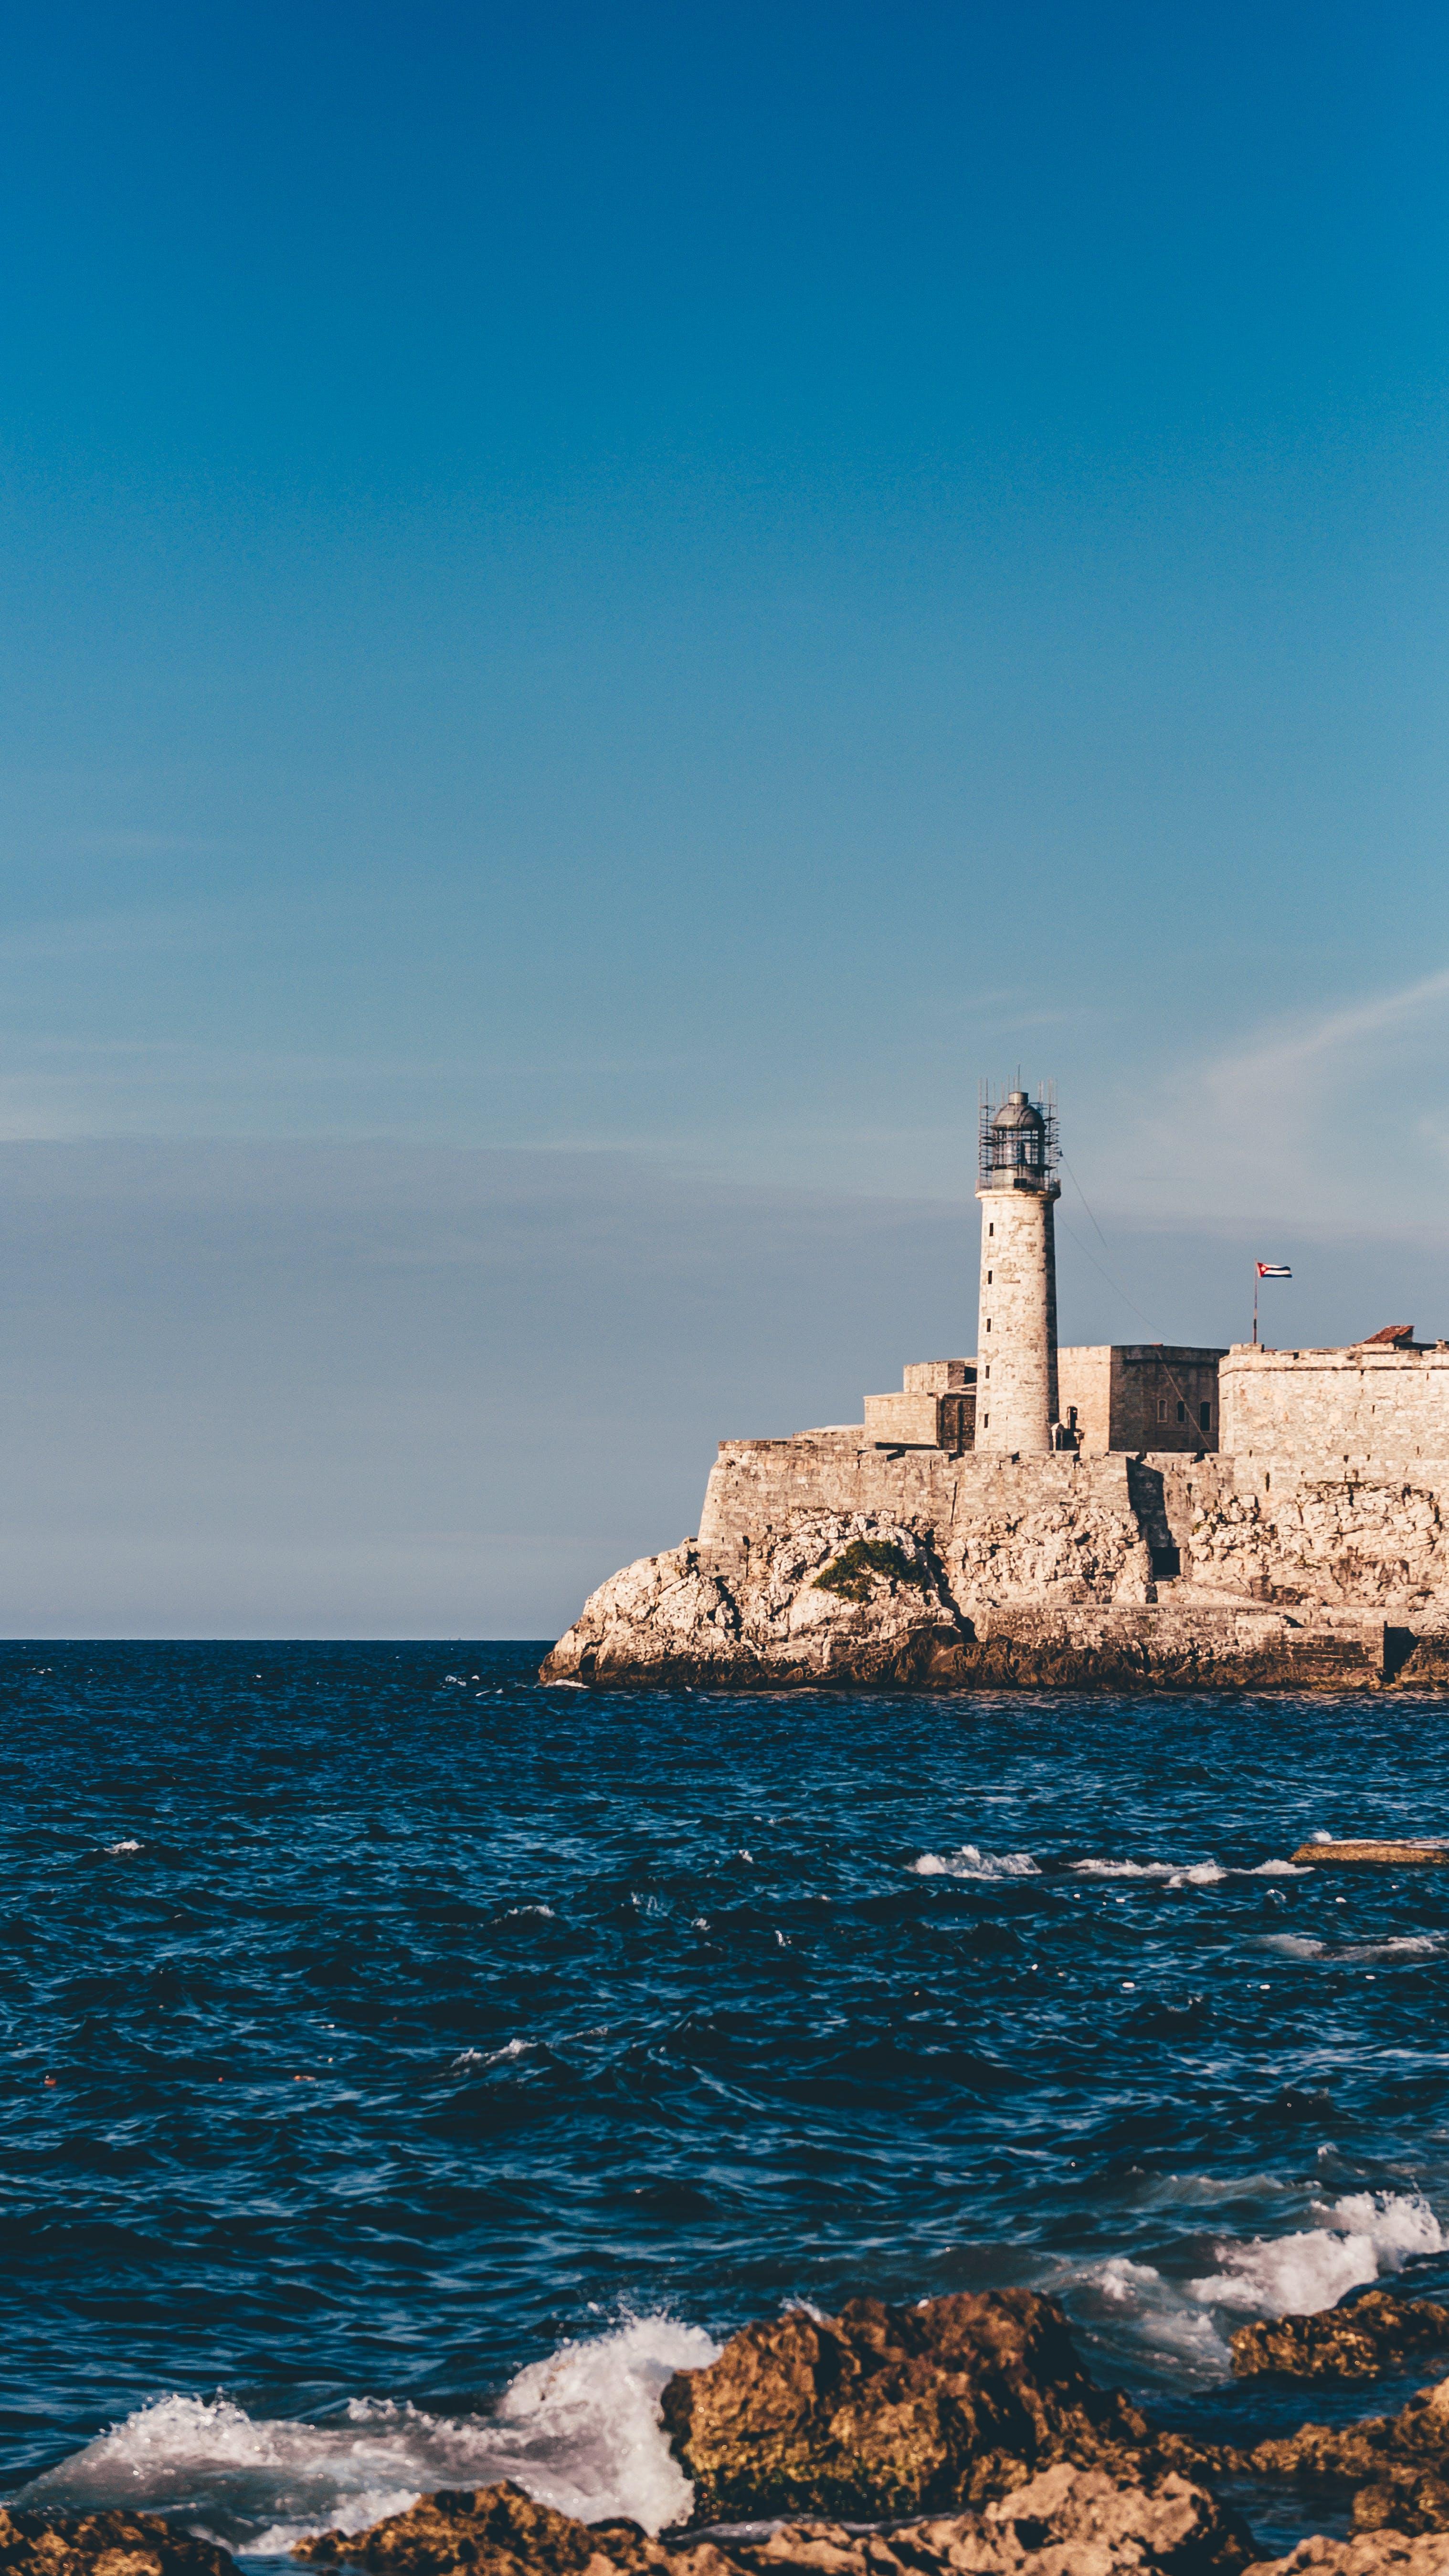 Free stock photo of landscape, lighthouse, ocean, ocean shore